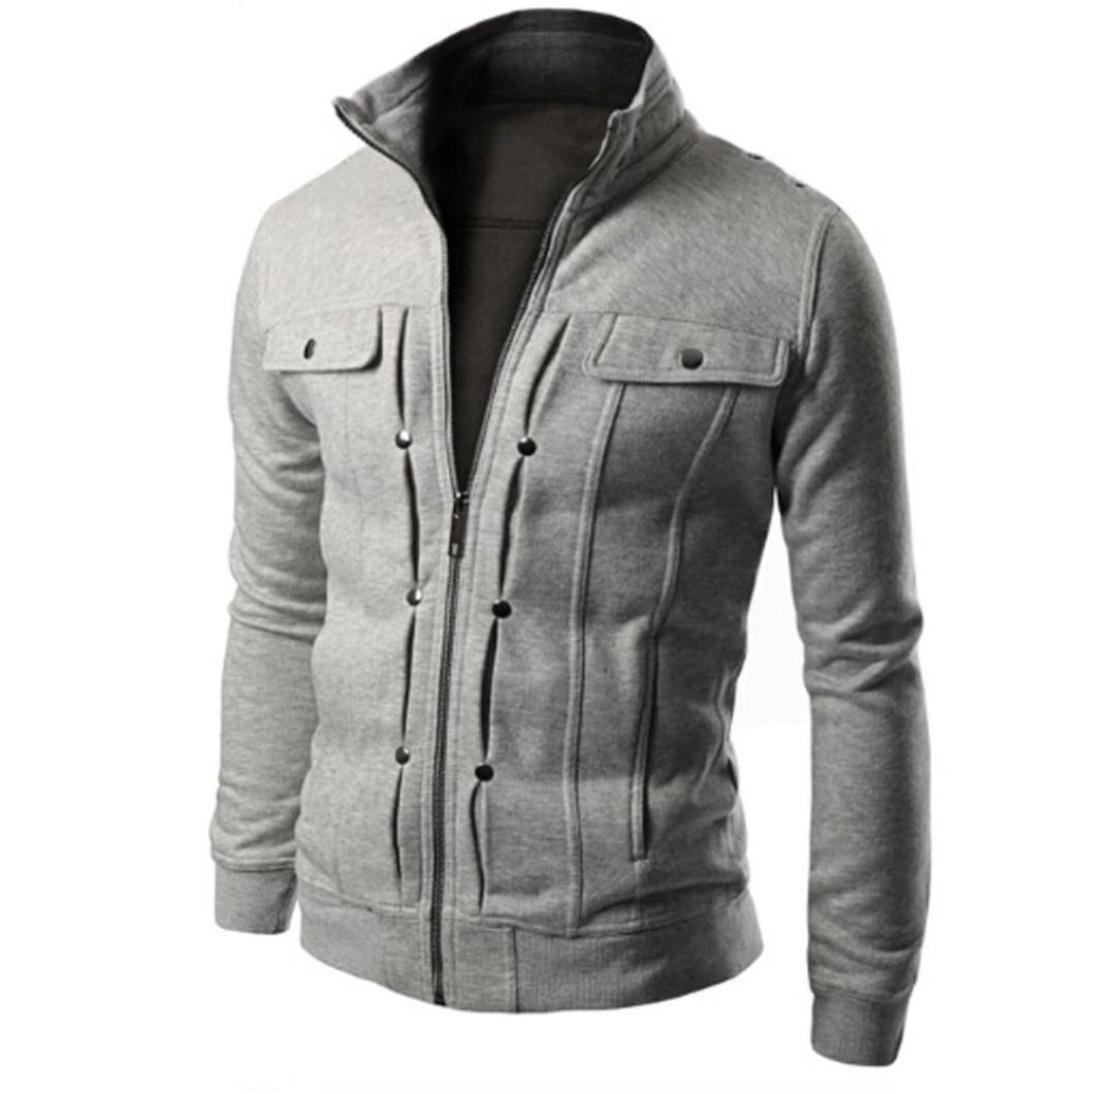 LNGRY Fashion Mens Slim Designed Lapel Cardigan Zipper Coat Winter Warm Jacket